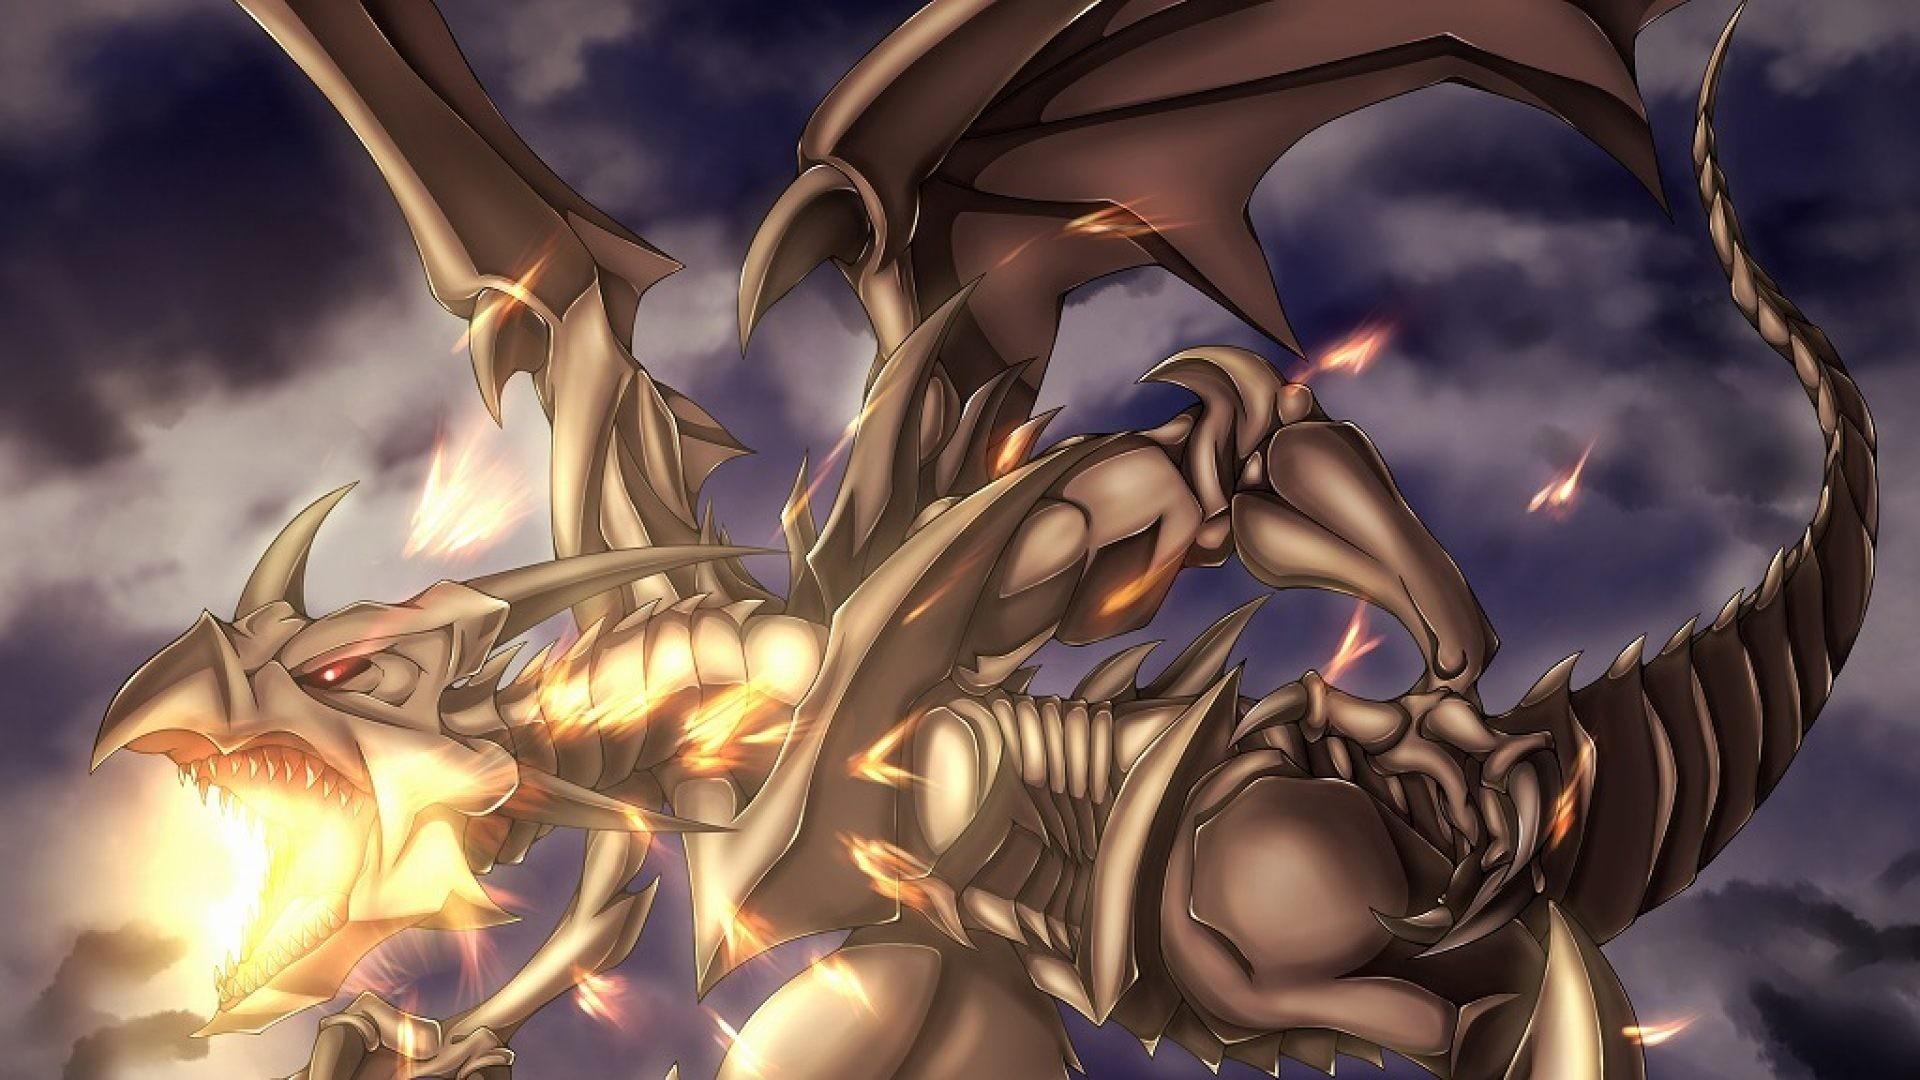 Dragon Eye Wallpaper (62+ images)